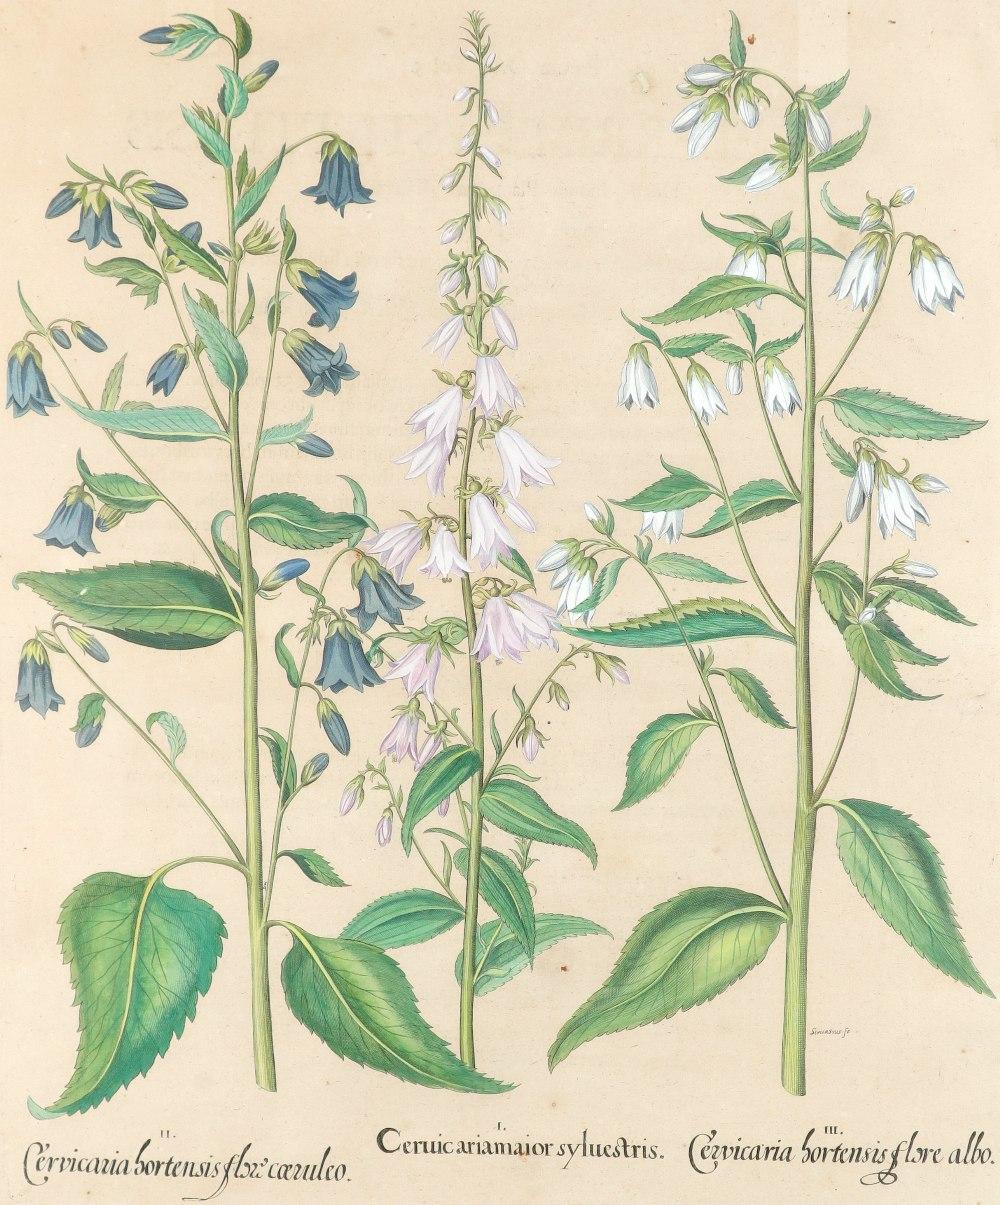 After Basilius Besler Poma flore multiplici; Aquilegia stellata flore vio laceo; Cytisus - Image 22 of 36